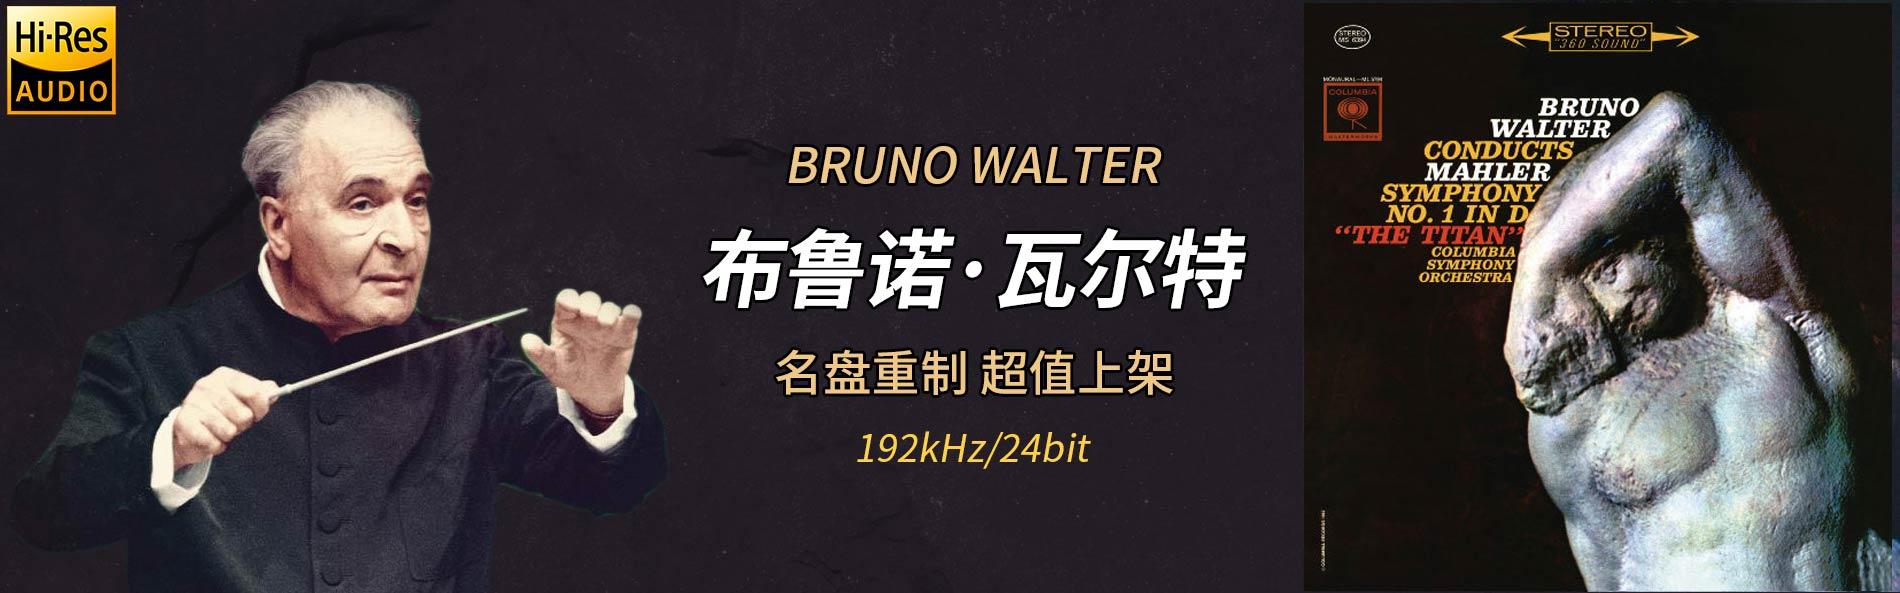 bruno191107